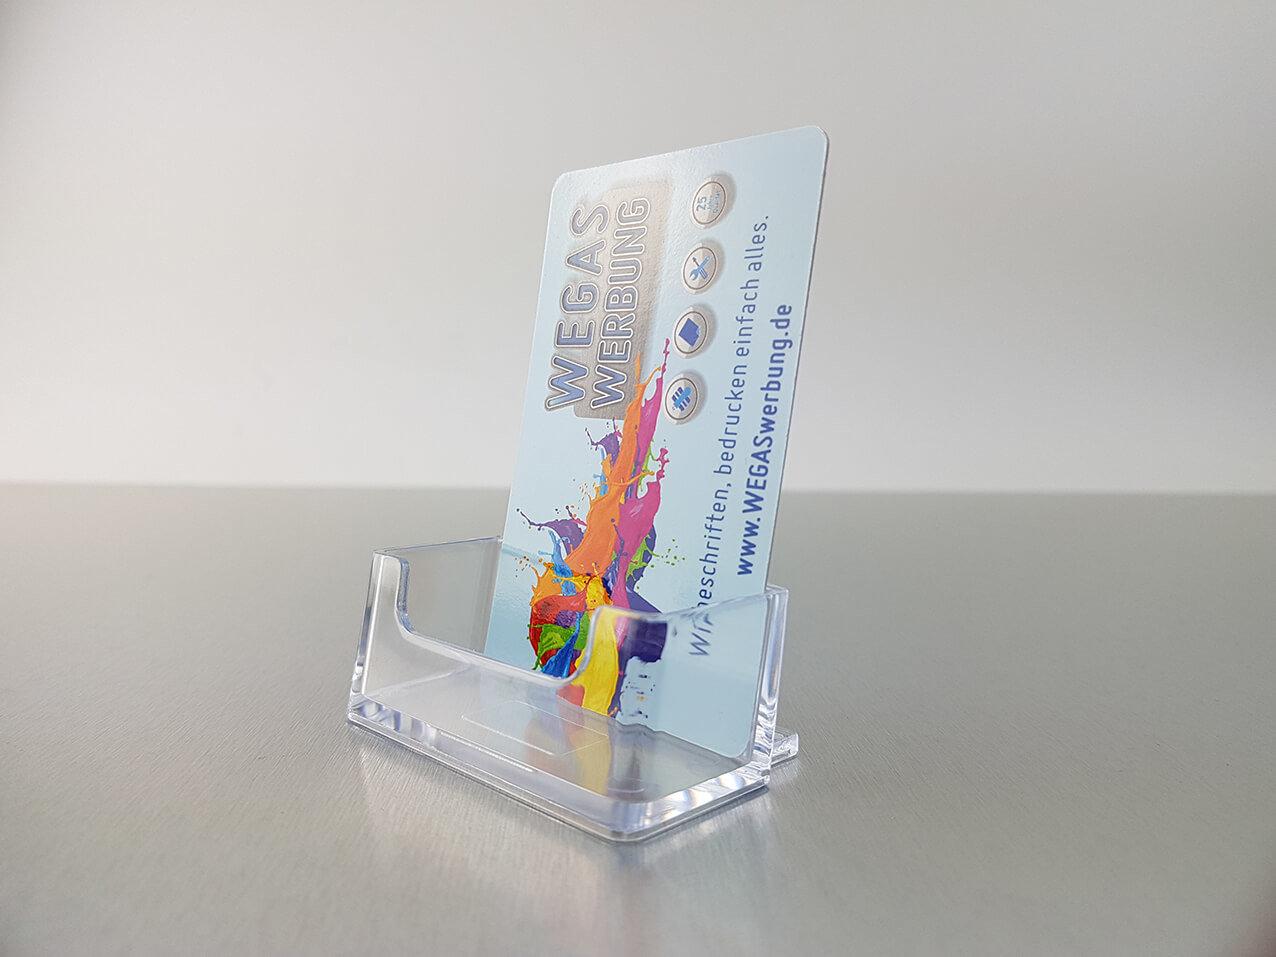 520 Visitenkartenbox Acryl 1211 Wegaswerbung